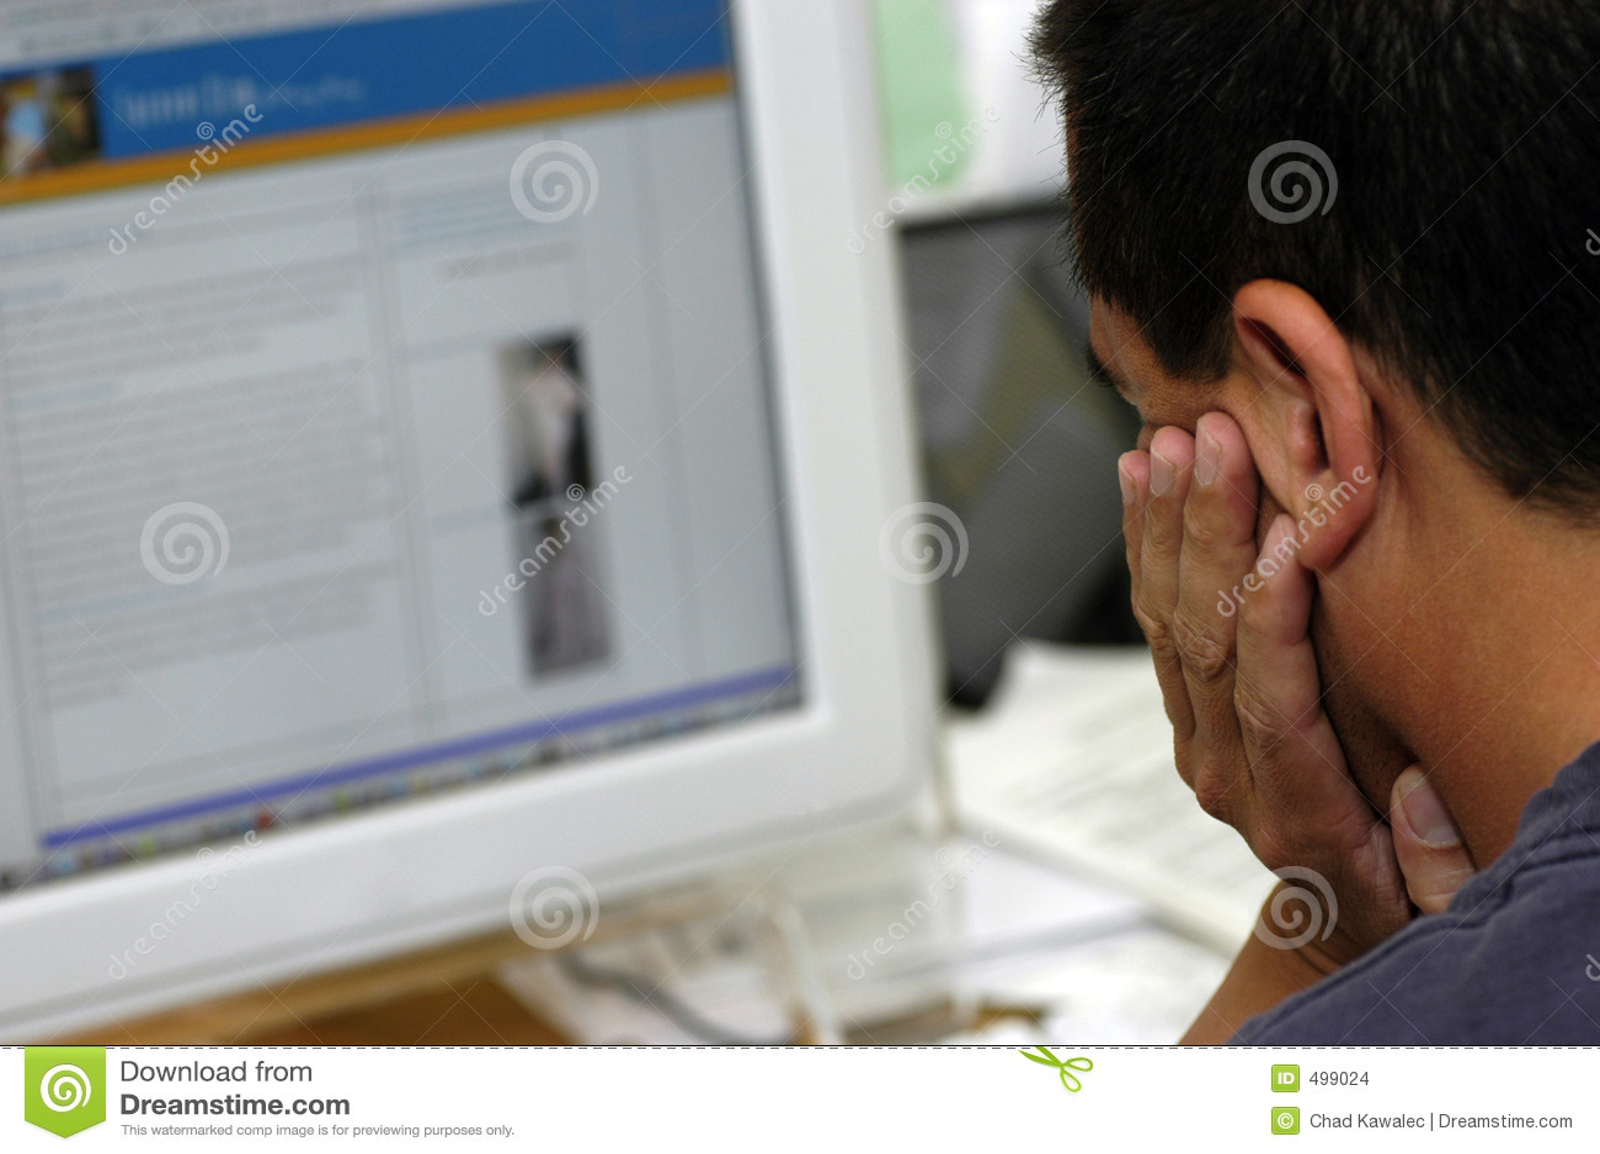 Man Looking At Computer Screen Stock Images Image 499024